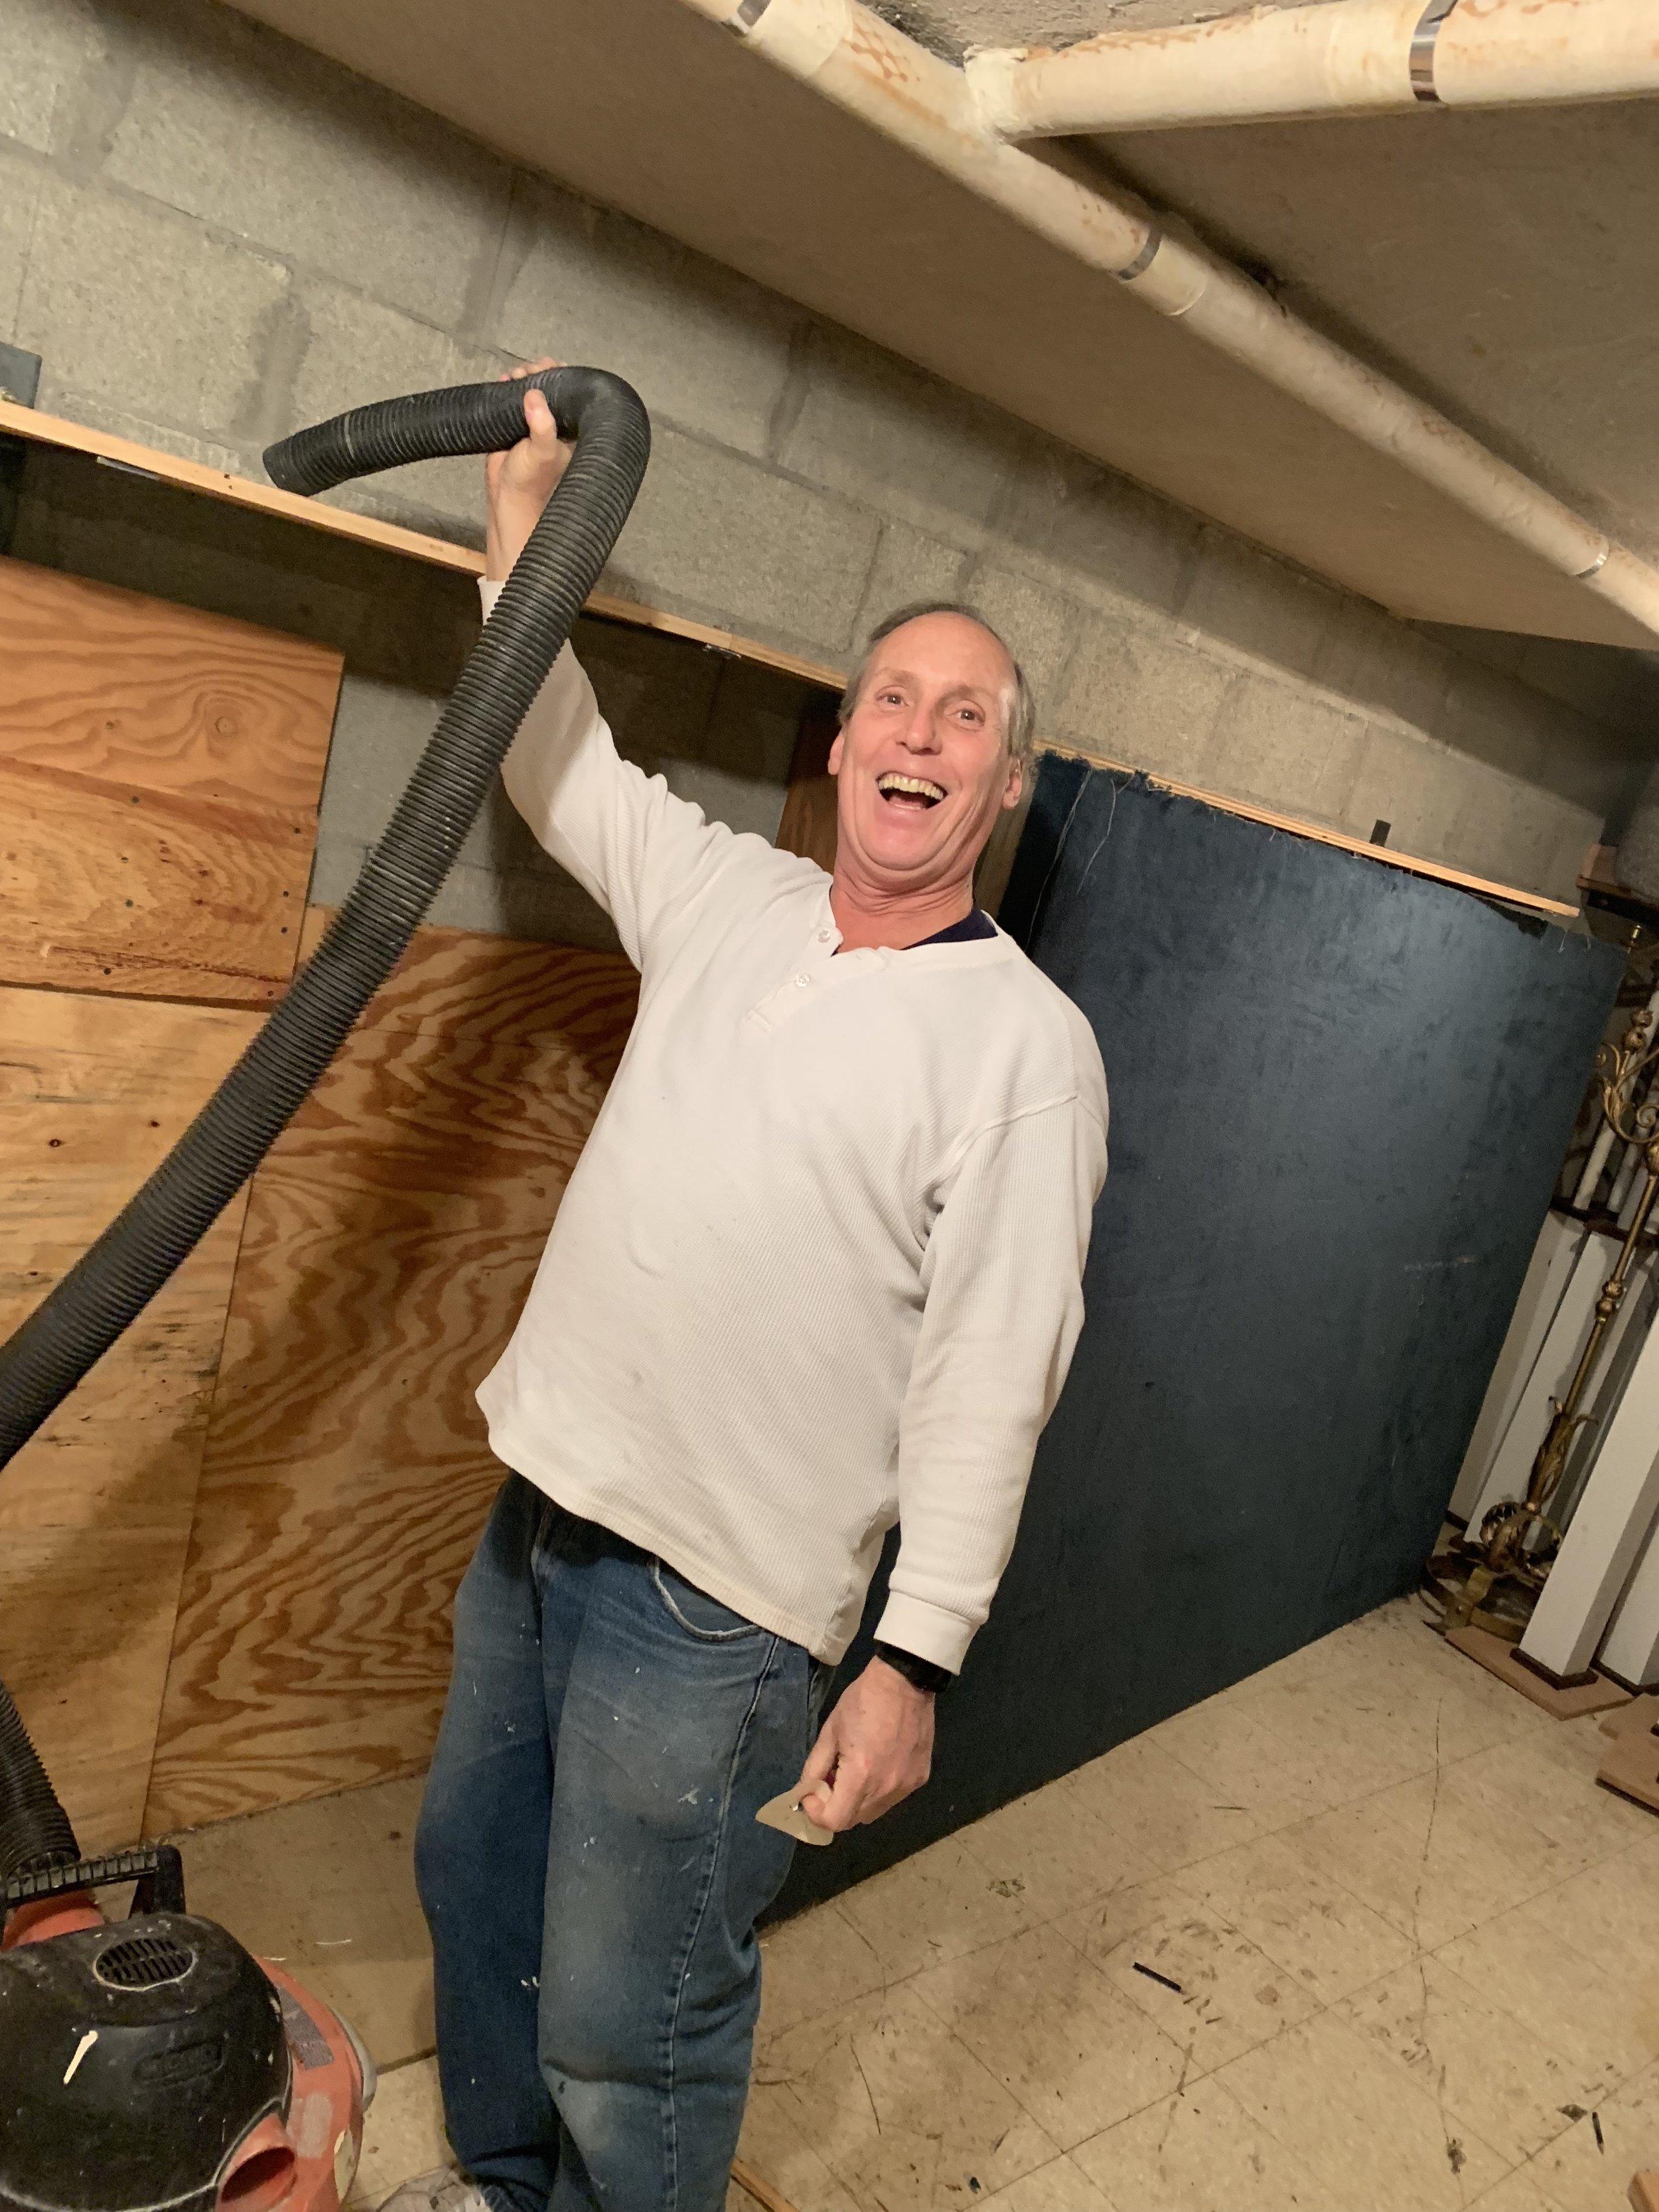 John Cleaning Closet.jpg